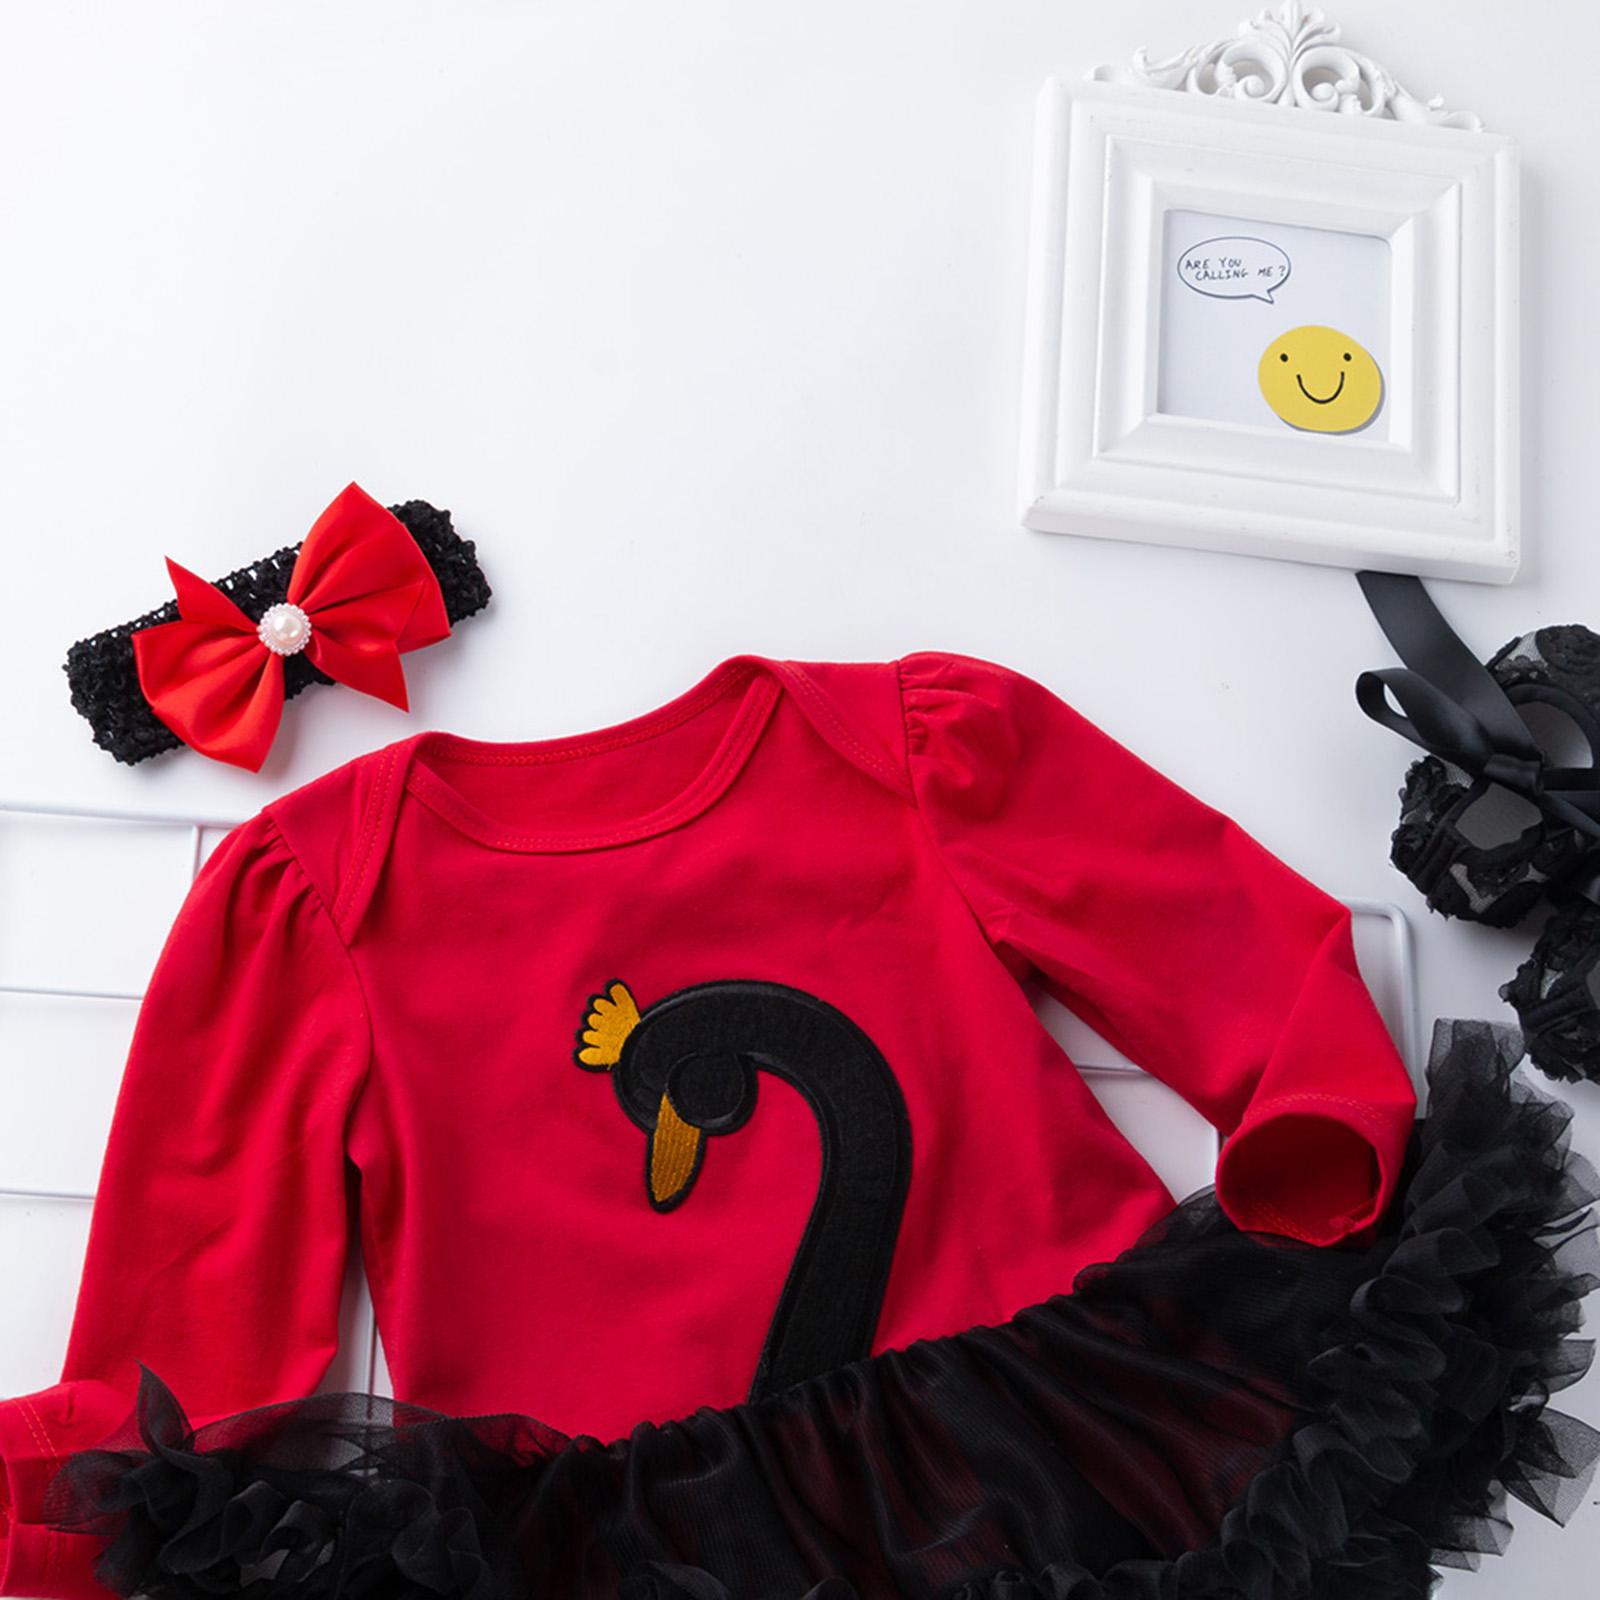 Baby Girls Ballet Dance Dress Set Swan Costume Tutu Dress Shoes Headband Outfits